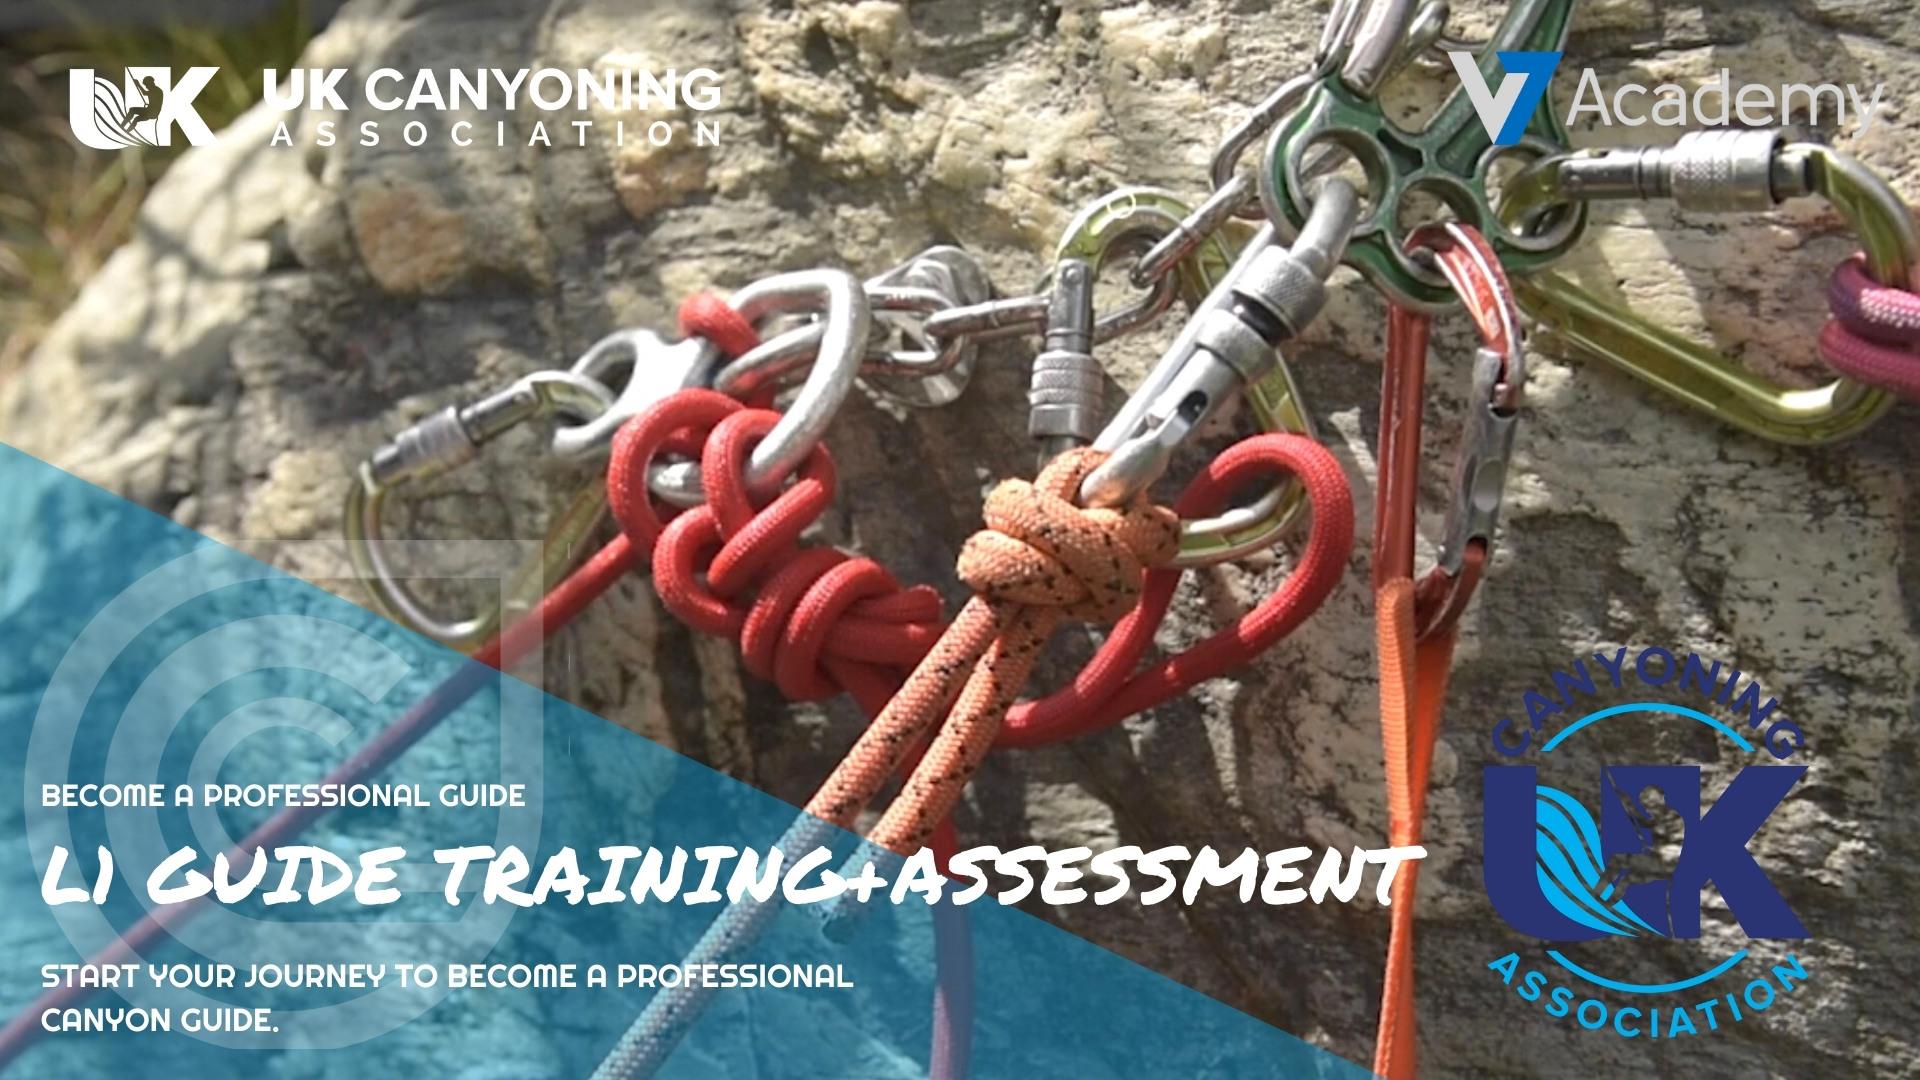 Canyon Guide Level 1 Training